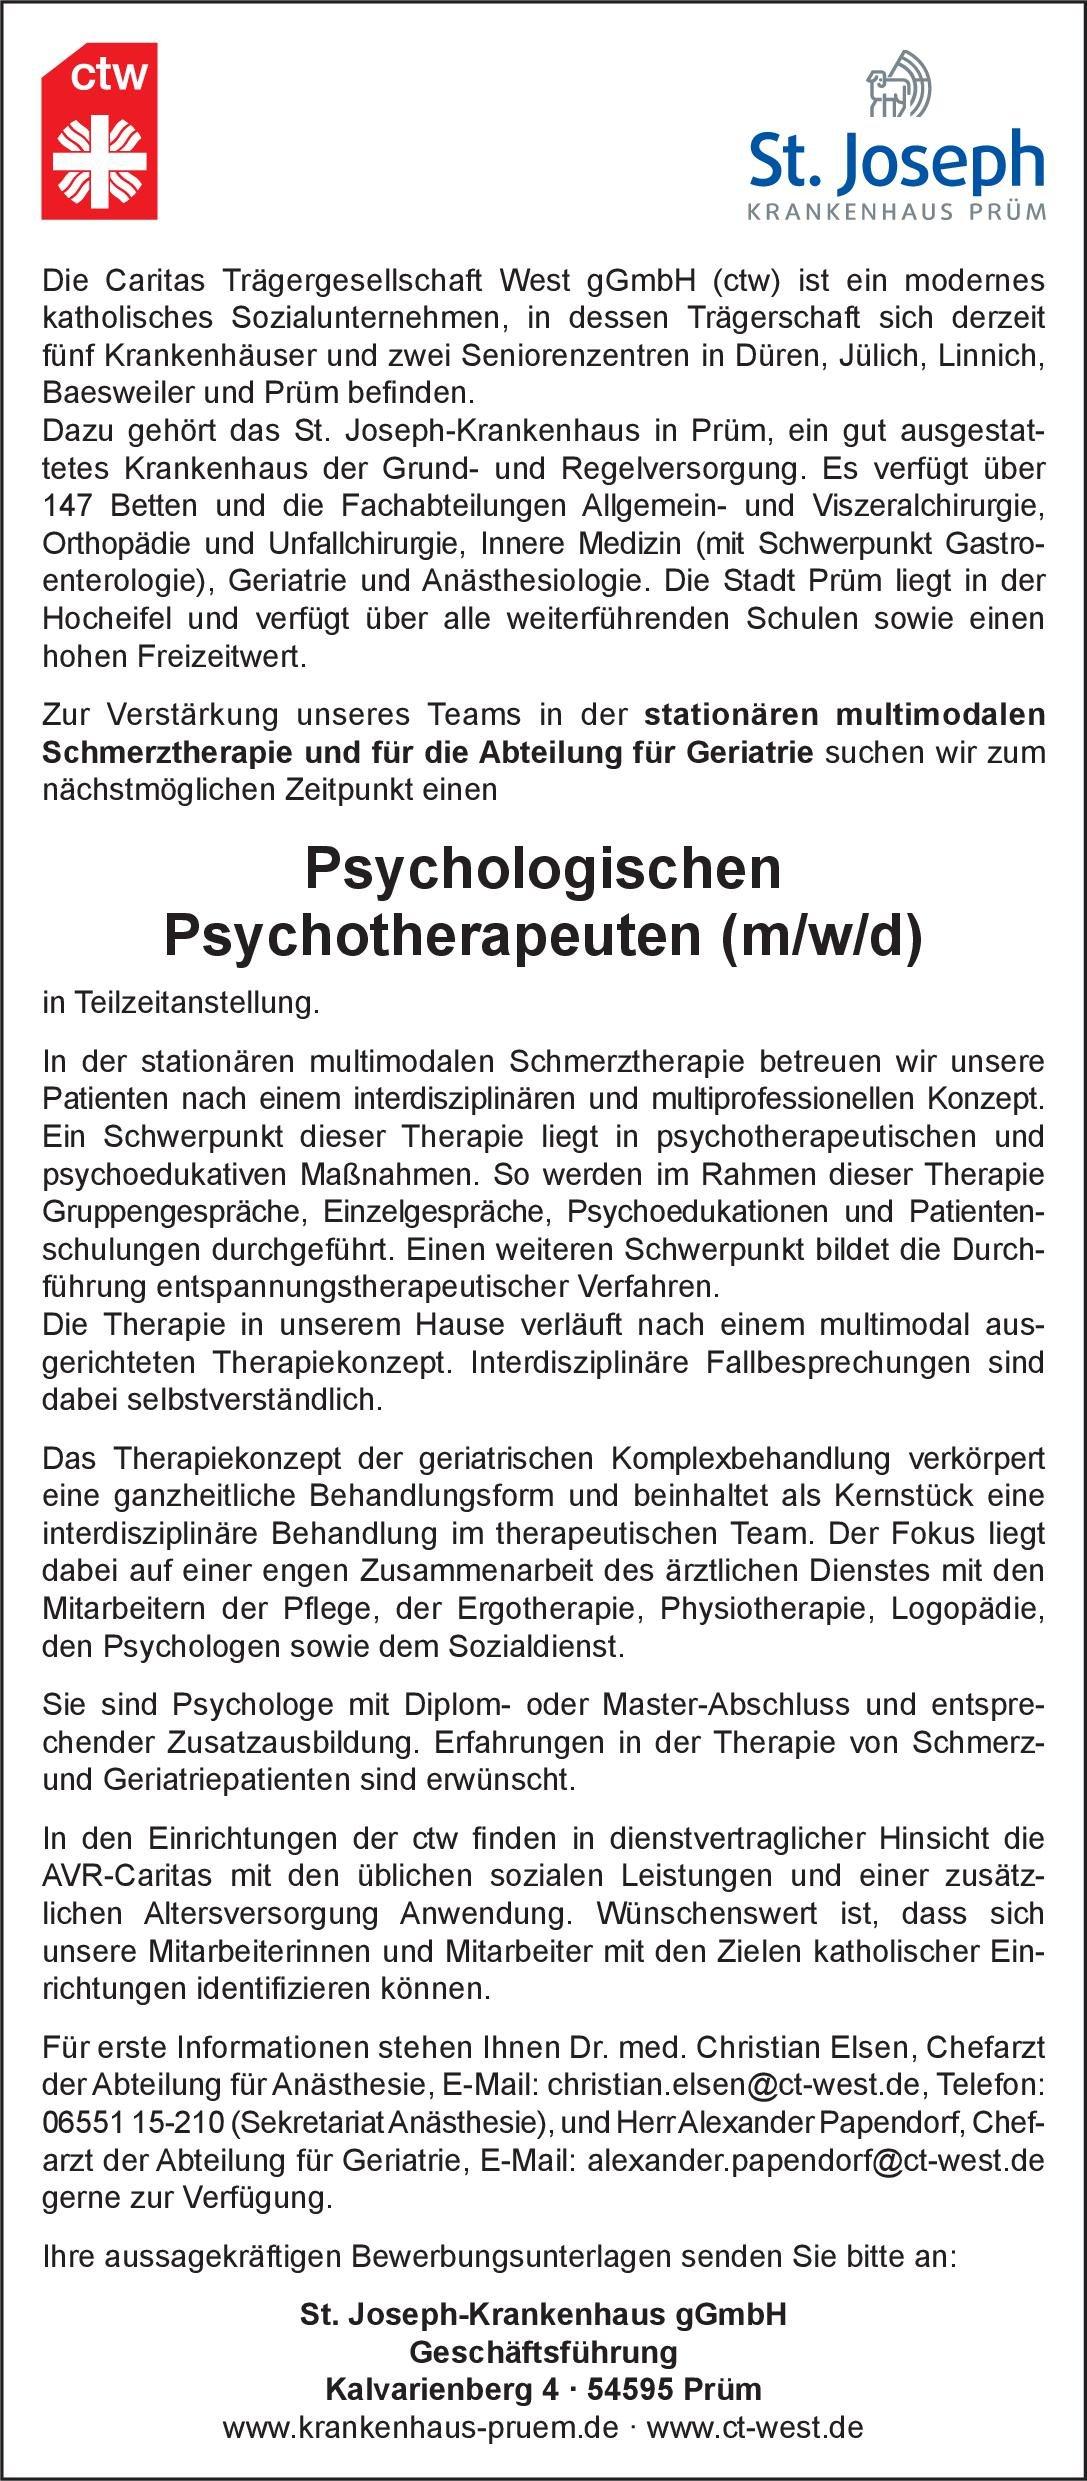 St. Joseph-Krankenhaus gGmbH Psychologischer Psychotherapeut (m/w/d)  Psychiatrie und Psychotherapie, Psychiatrie und Psychotherapie Psych. Psychotherapie